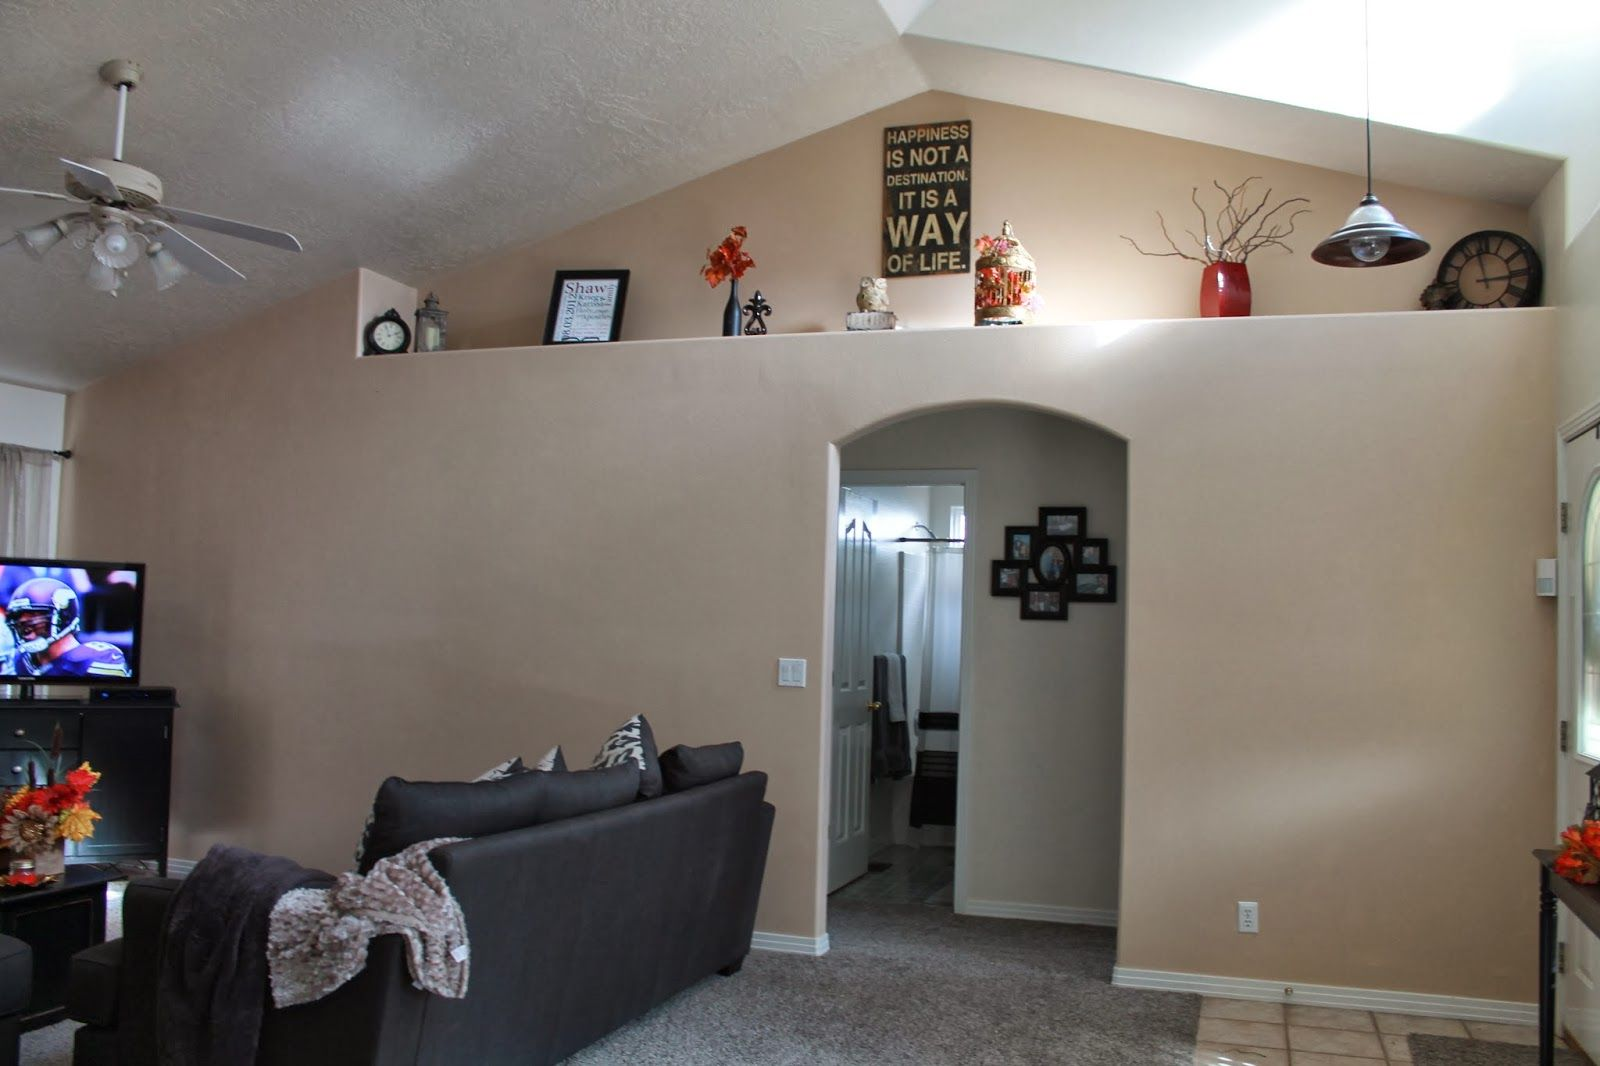 Pin by jill nissen on home decor living room decor wall - Living room ledge decorating ideas ...